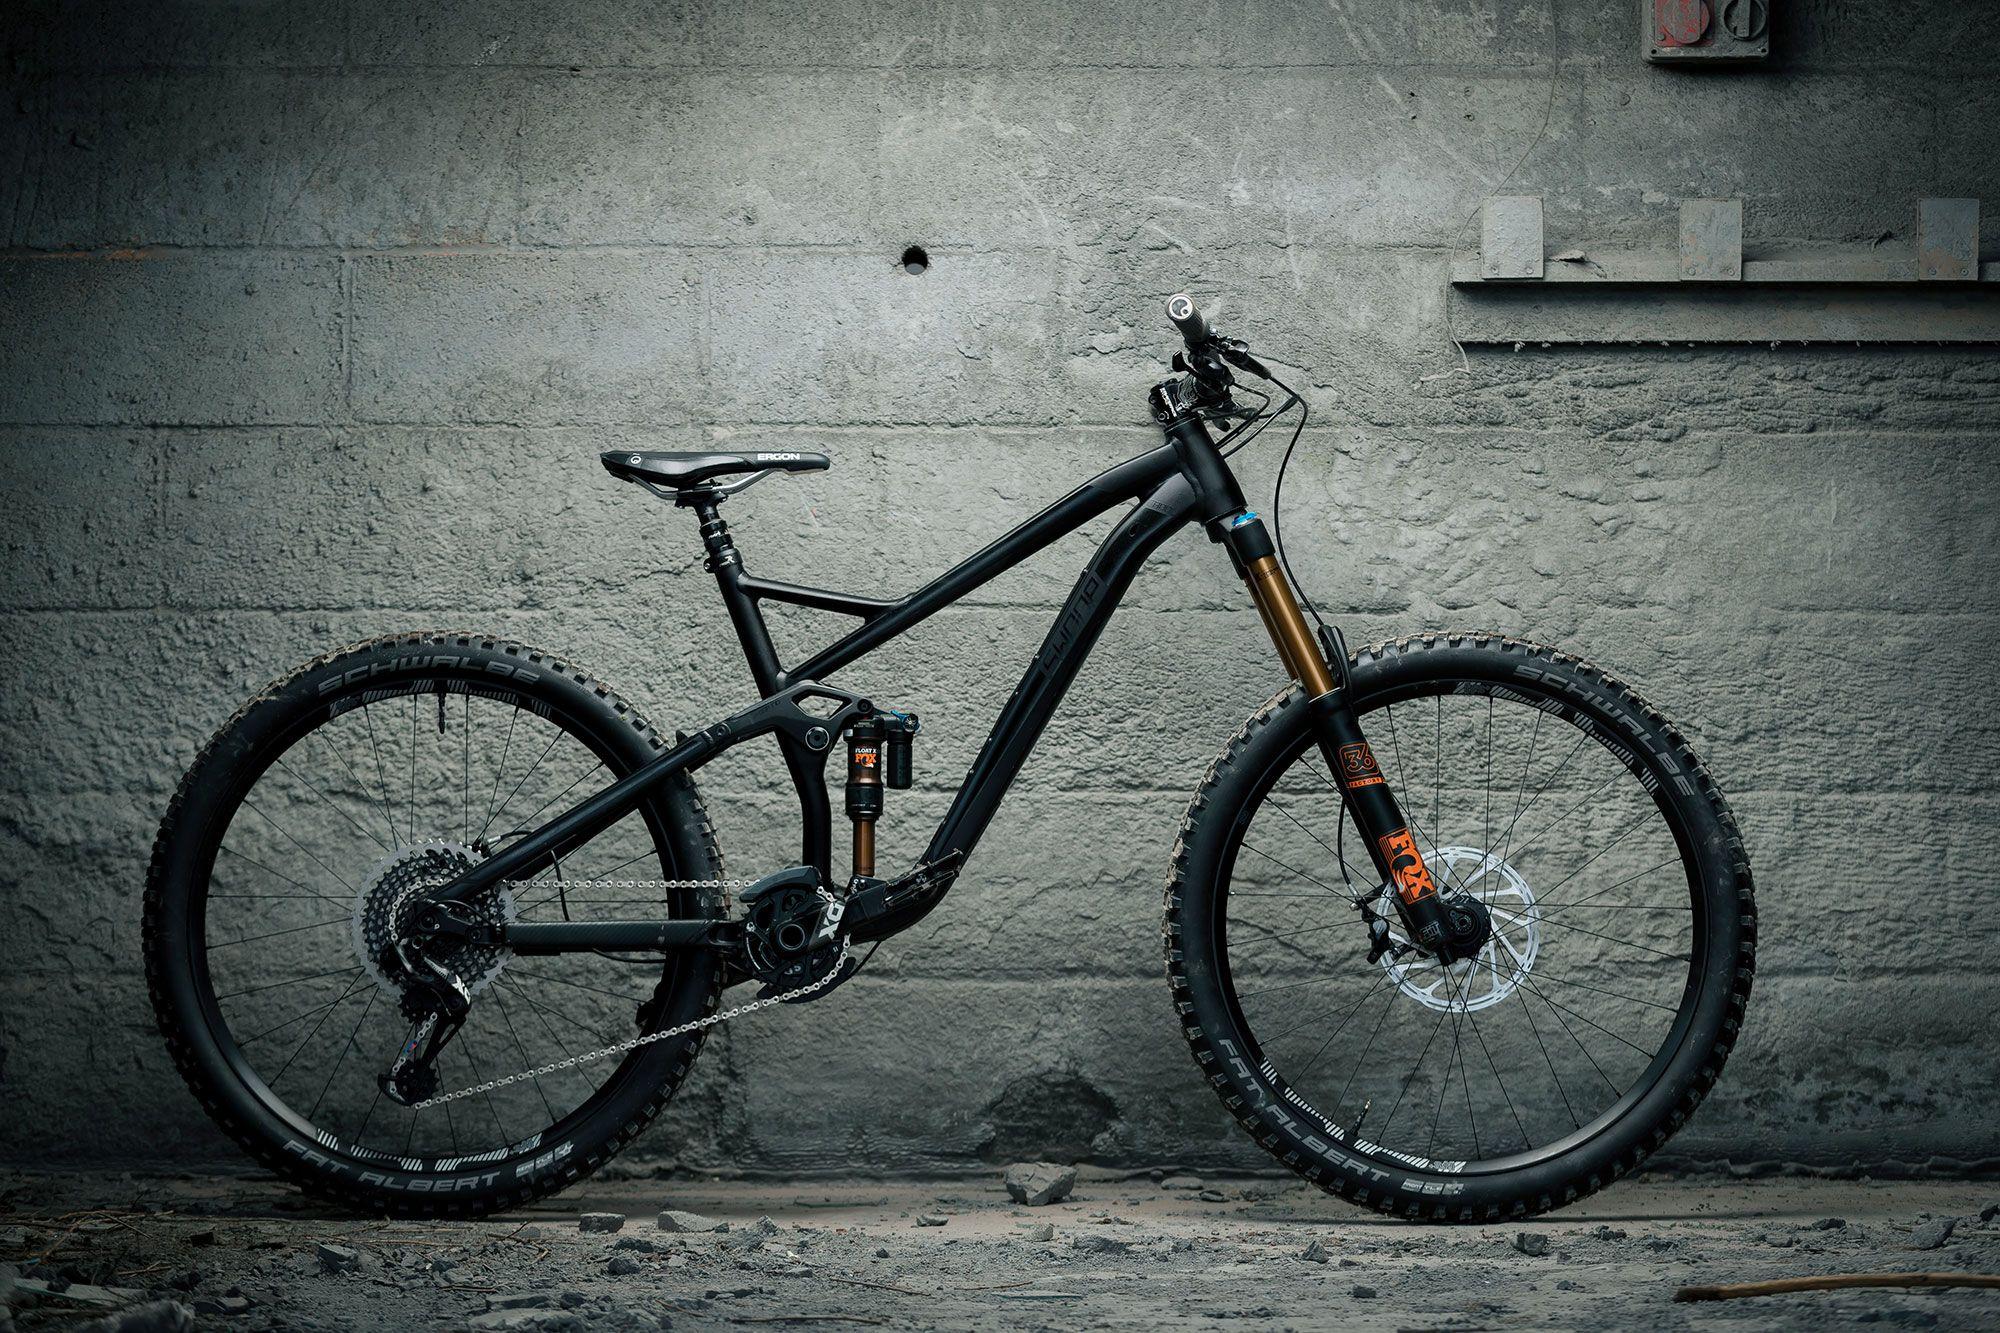 50779b7887e RADON SWOOP 170 - Dirt Mens Mountain Bike, Hardtail Mountain Bike, Mountain  Bike Brands